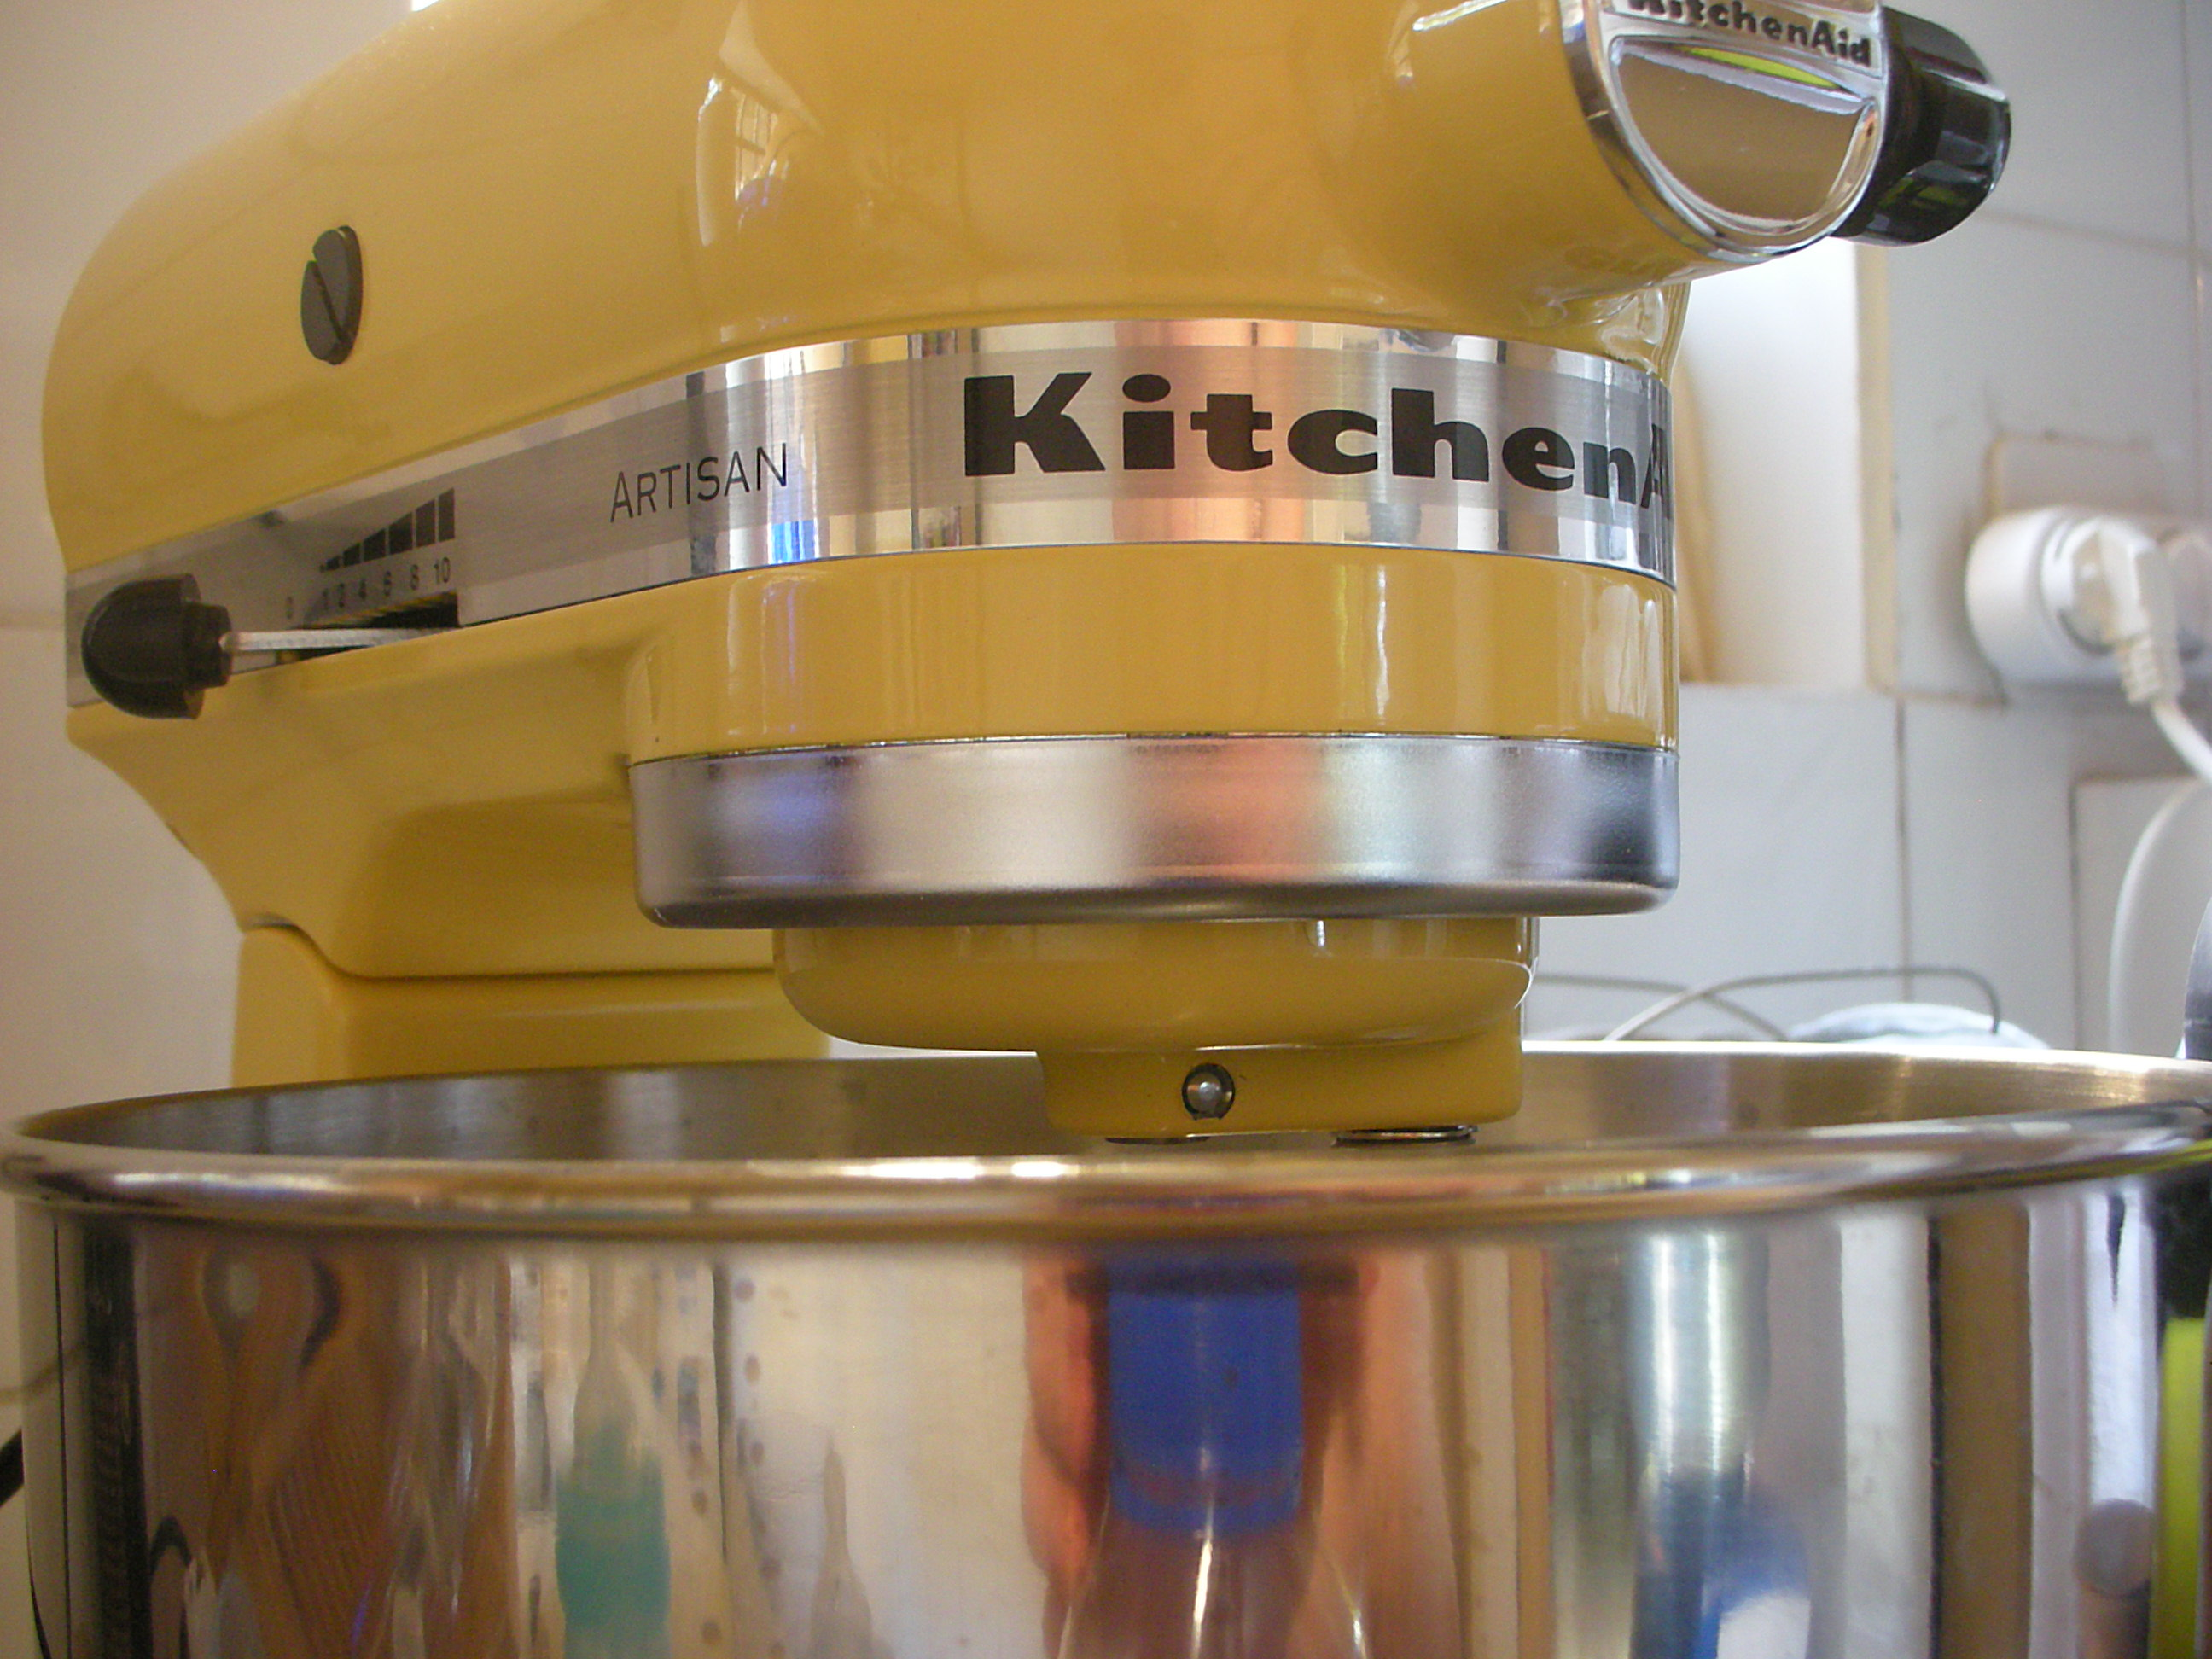 Kitchenade mixer Photo - 6